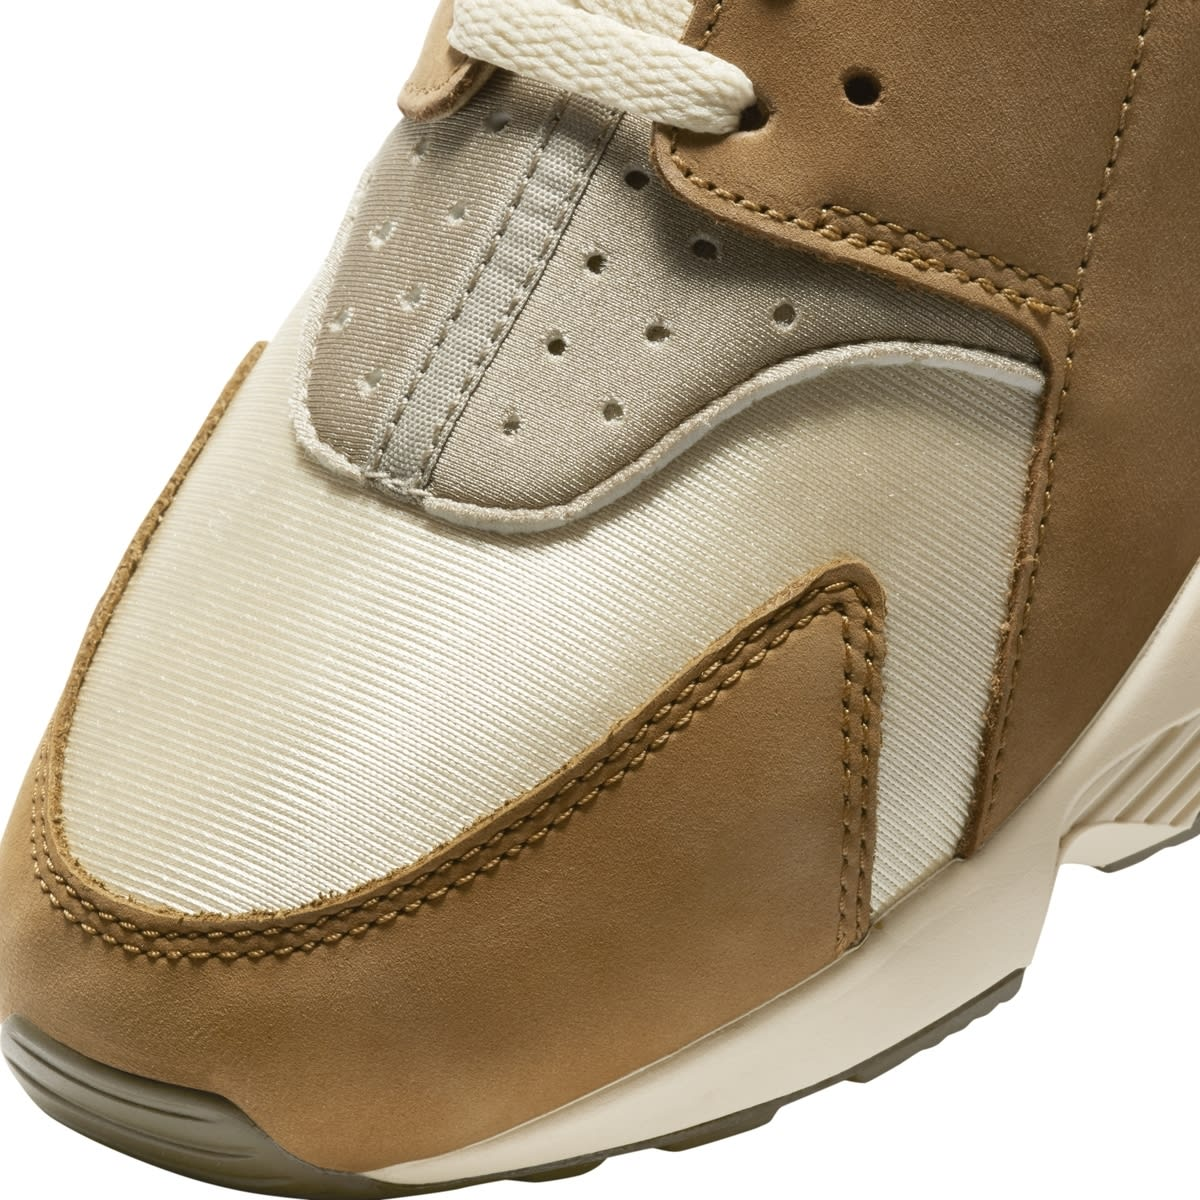 Stussy x Nike Air Huarache 'Desert Oak/Reed/Light Straw' DD1381-200 (Toe Detail)